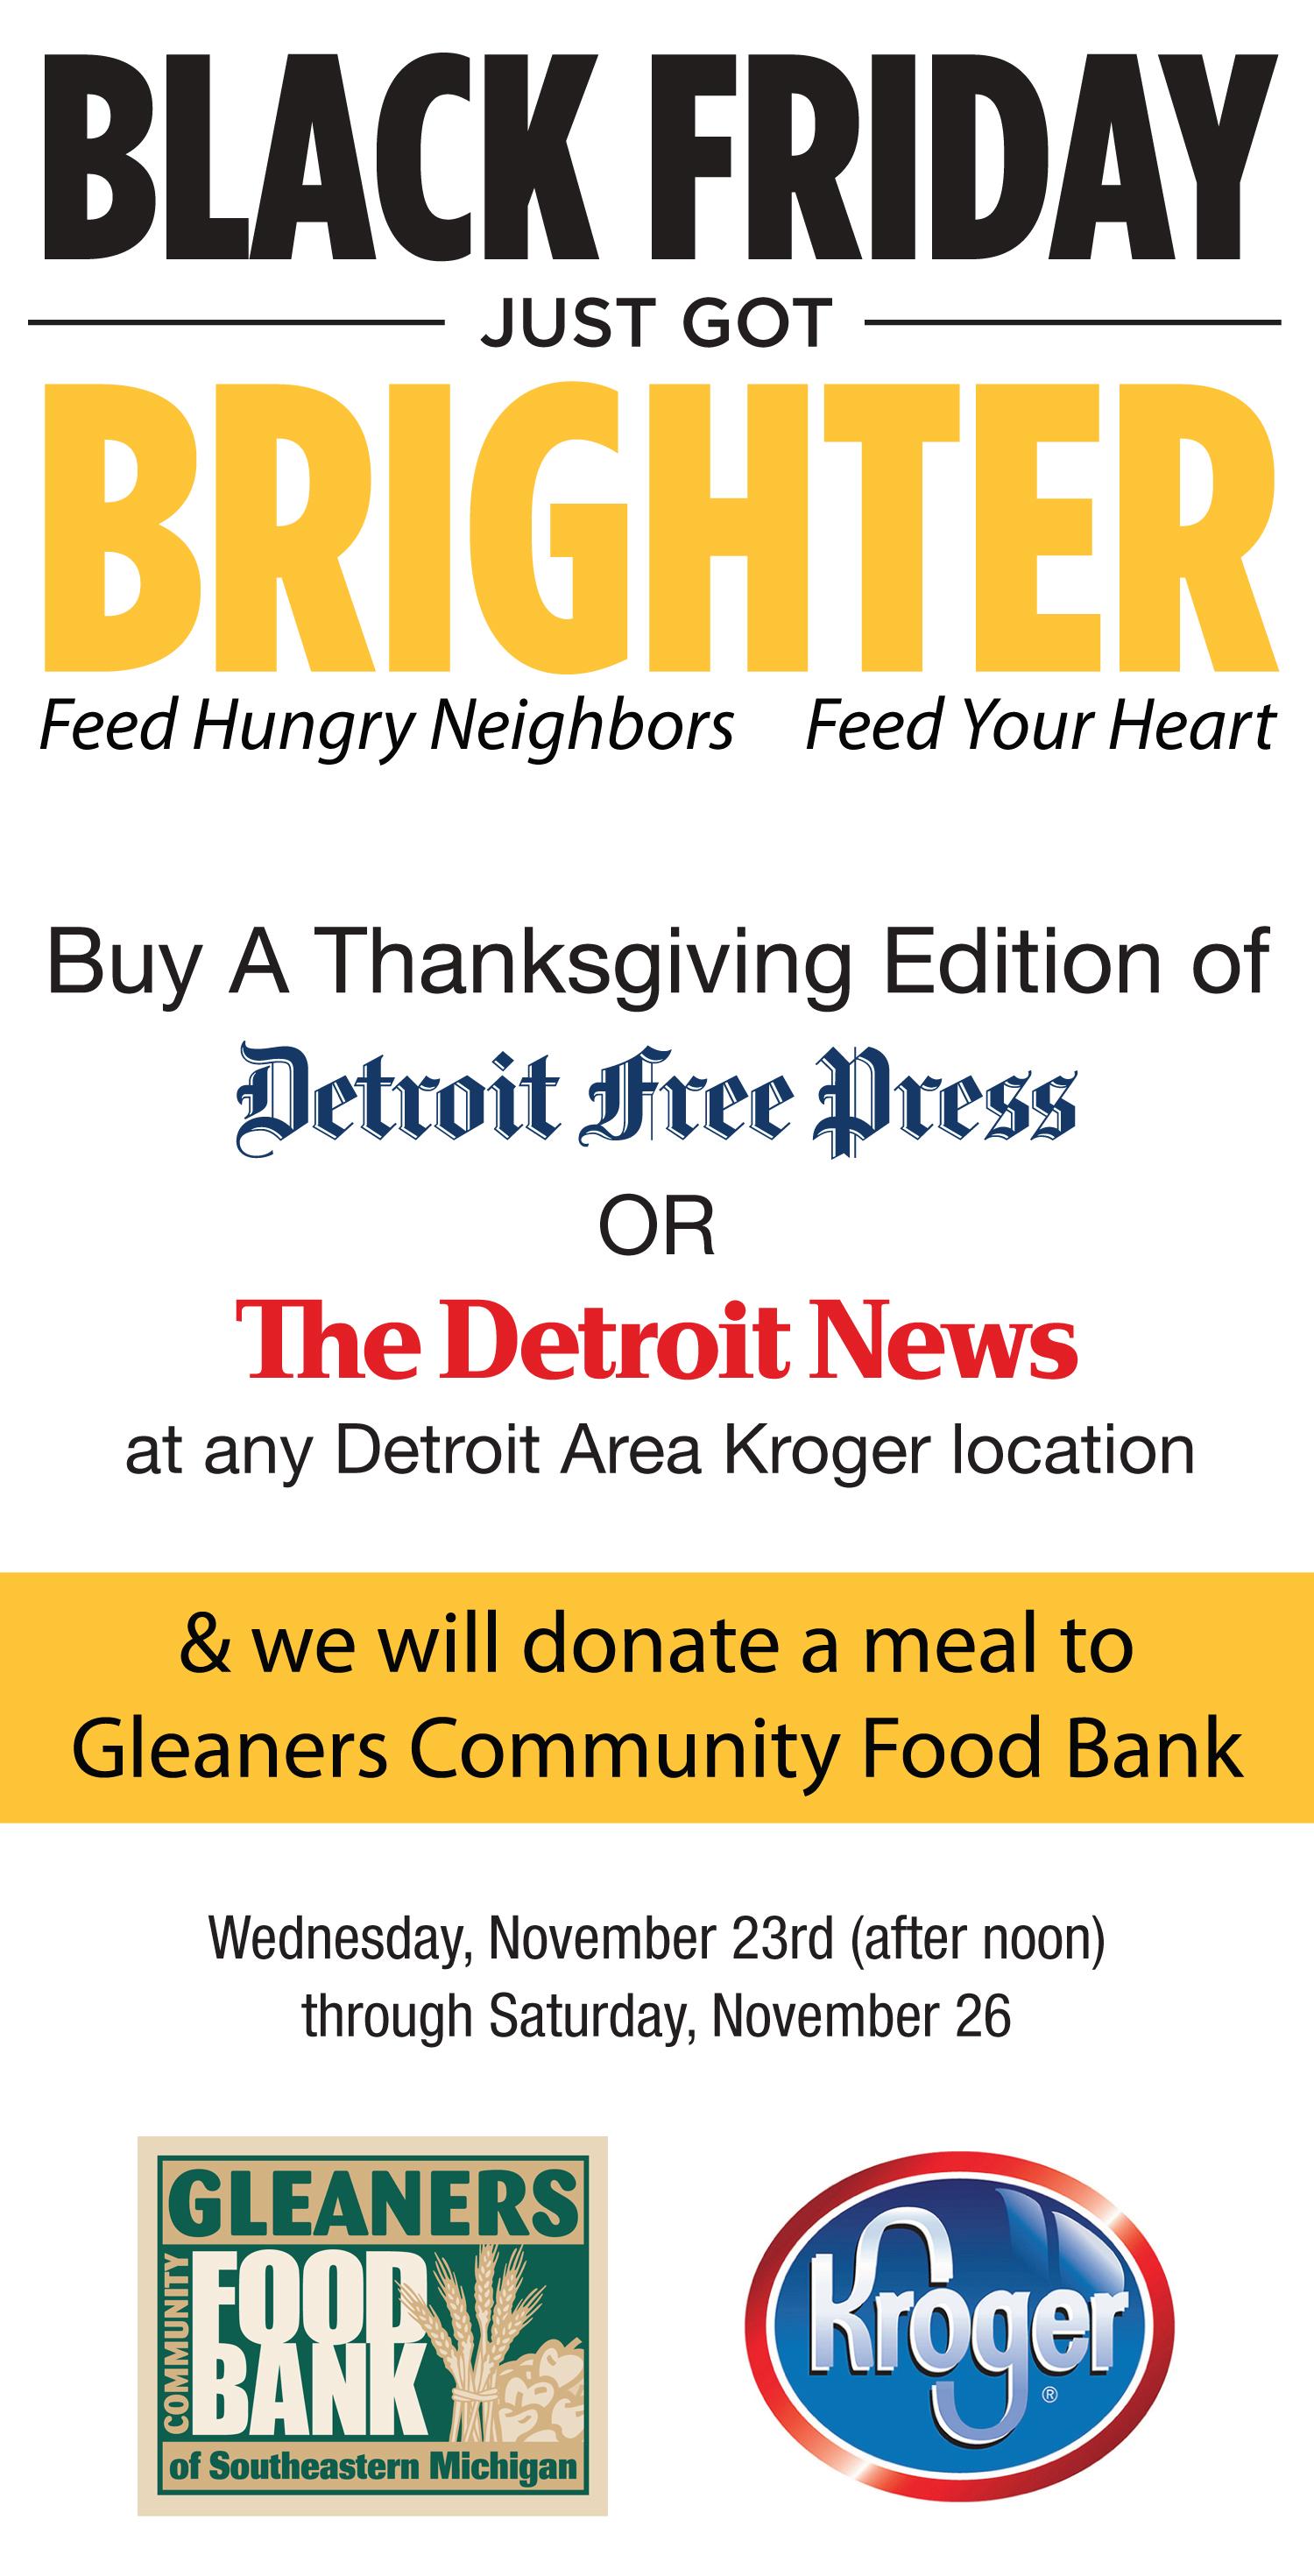 SC7076_DetroitSites_Kroger_ThanksgivingPromo_ROP_5x10.jpg